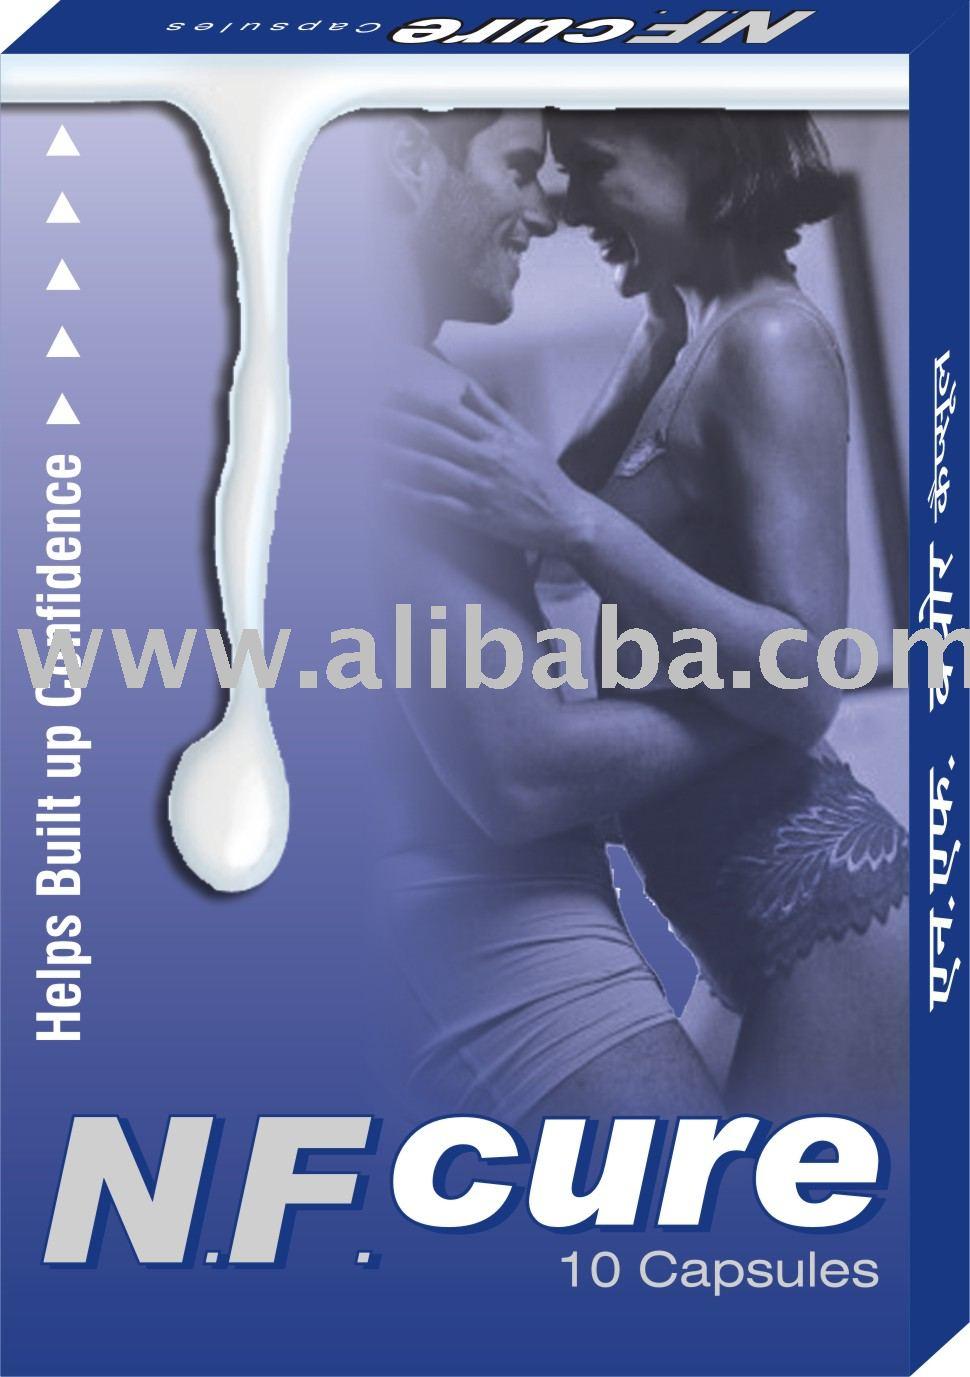 NF Cure Capsules Stop Nightfall and Semen Leakage